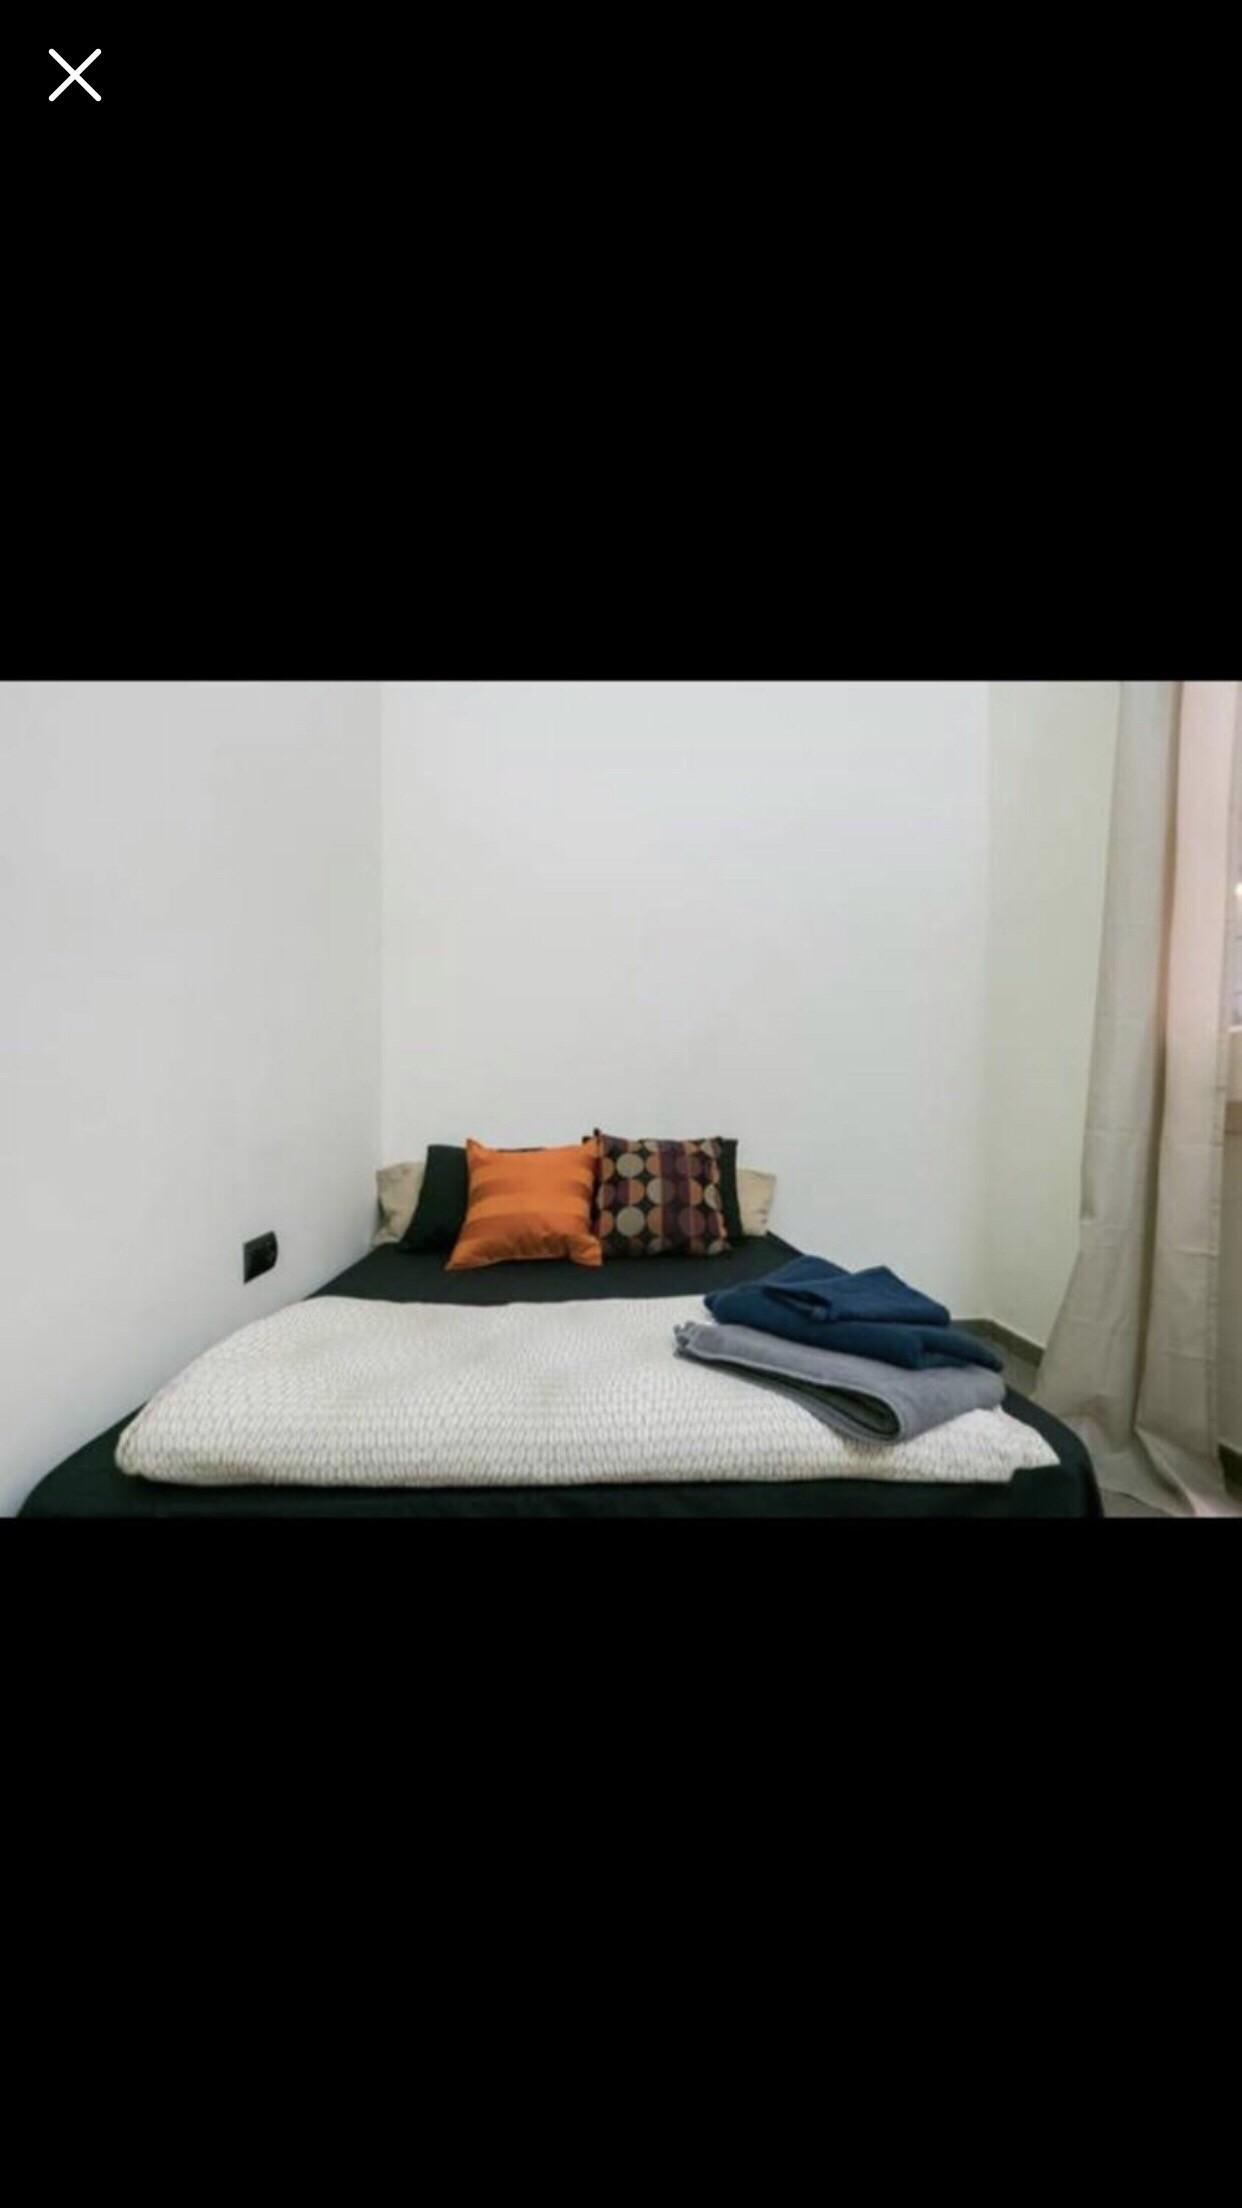 double-bed-roomin-room-flat-b92a0ad2fa6a0f94a2b8b410dba070e1